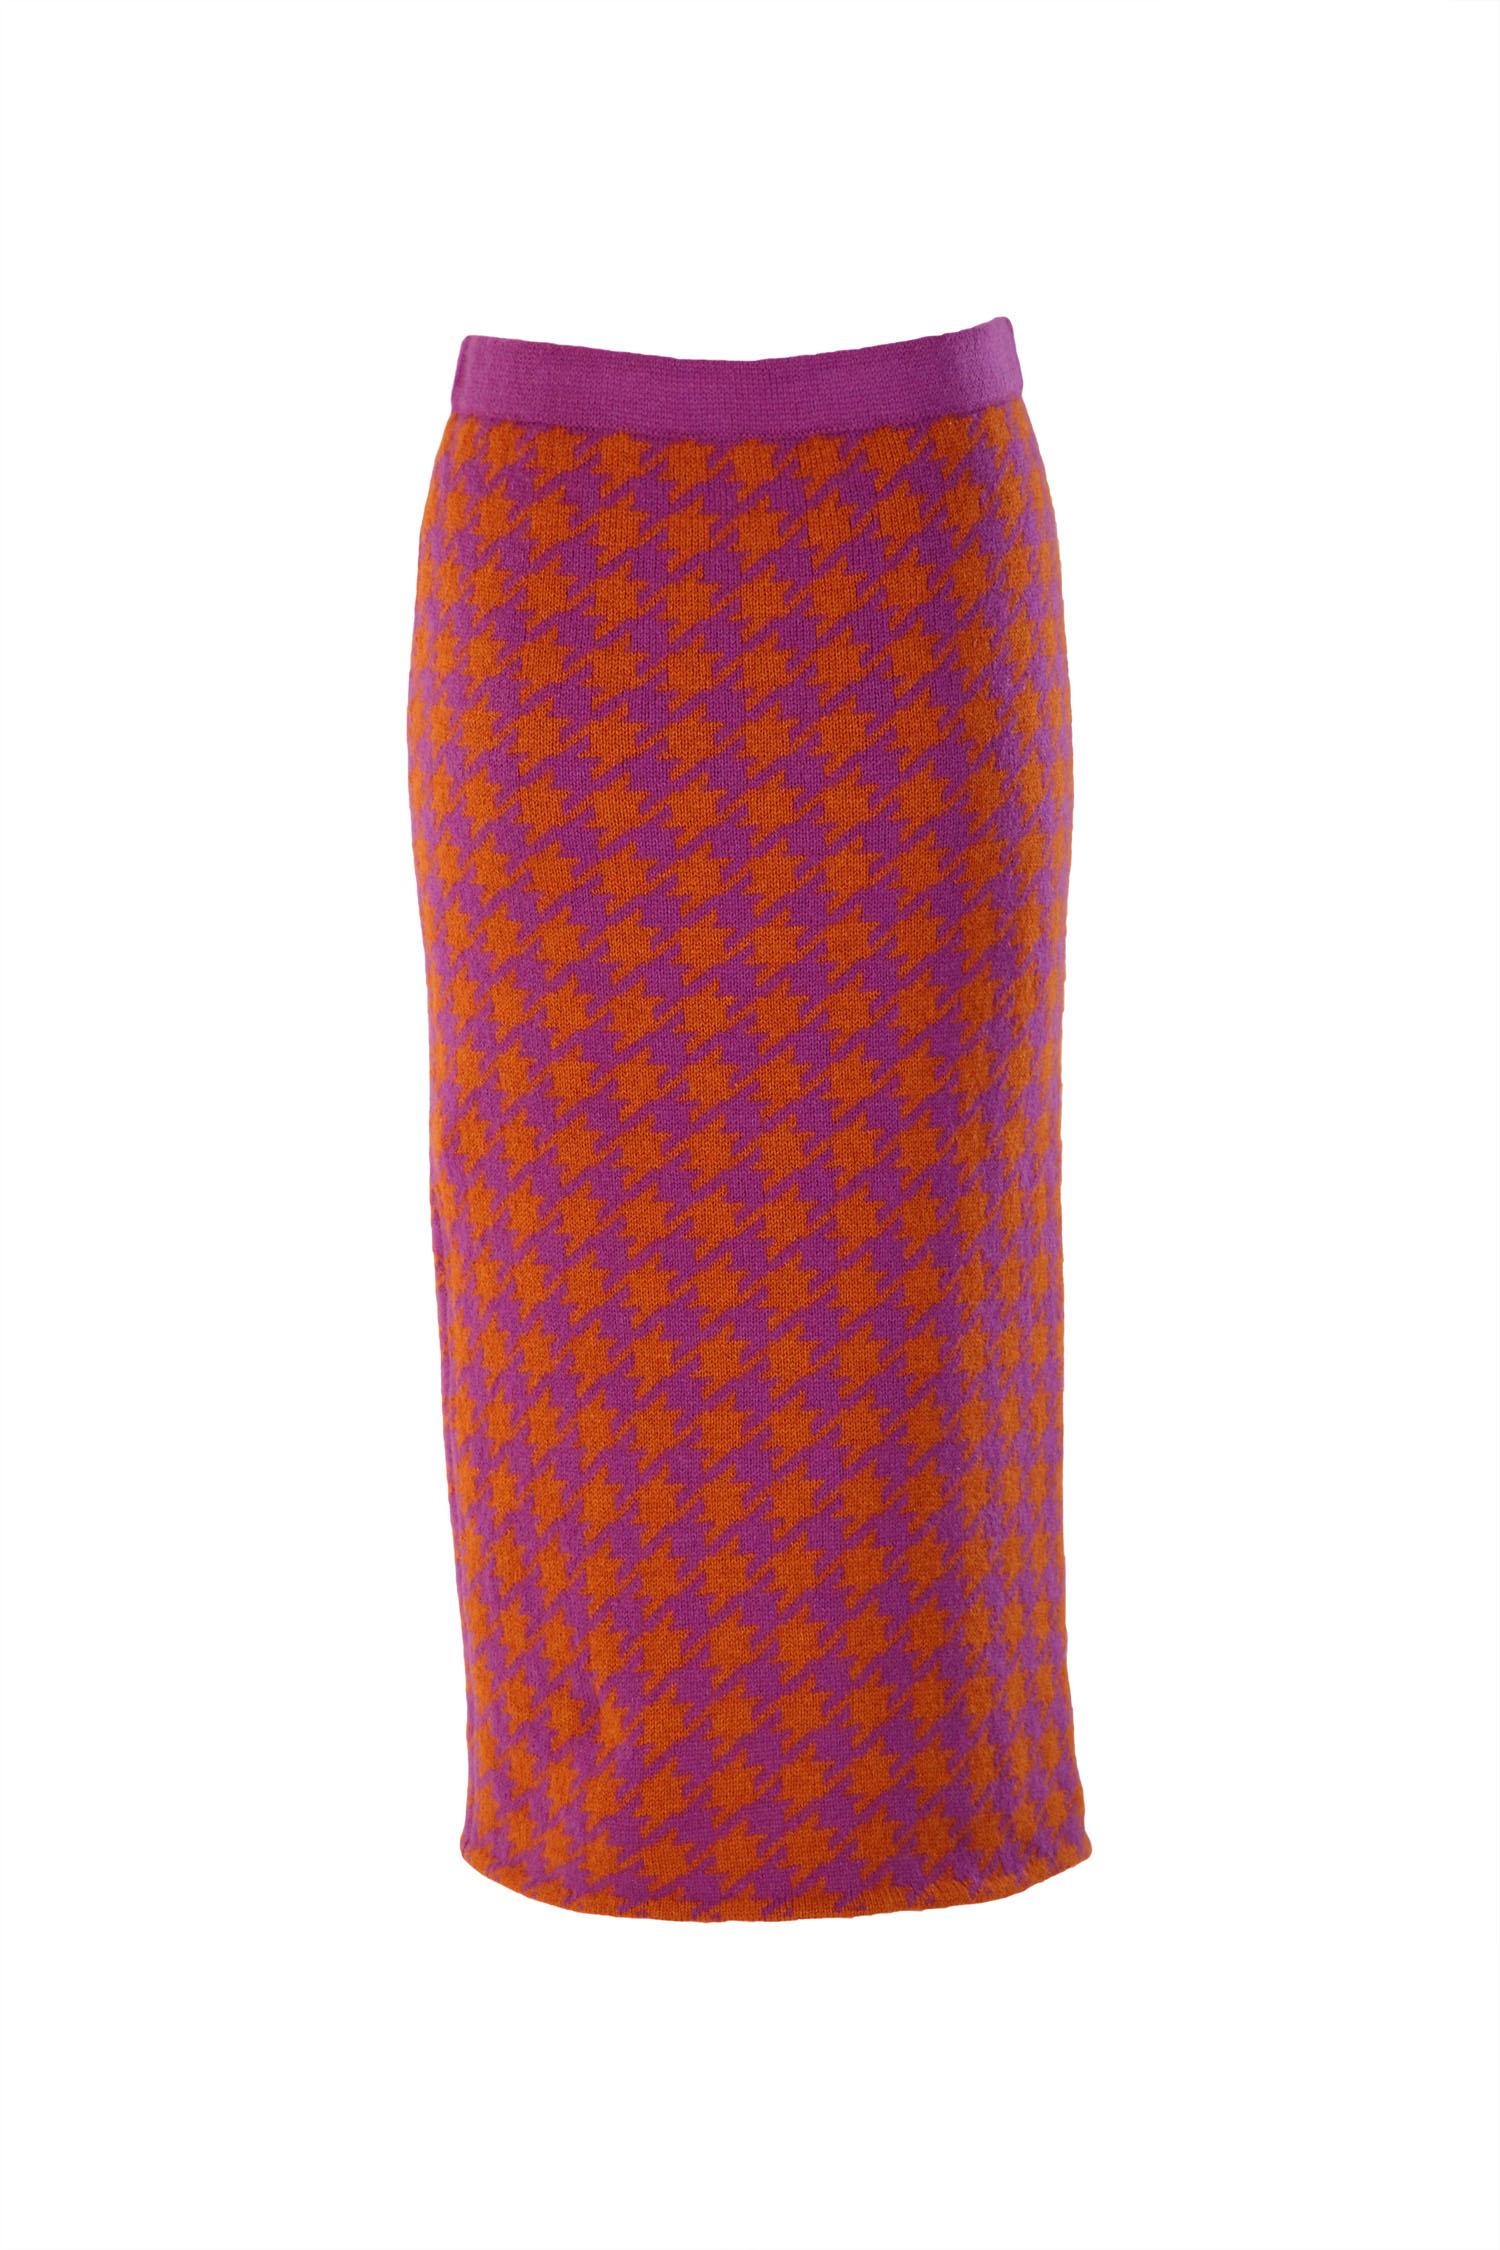 Dogtooth pencil skirt2